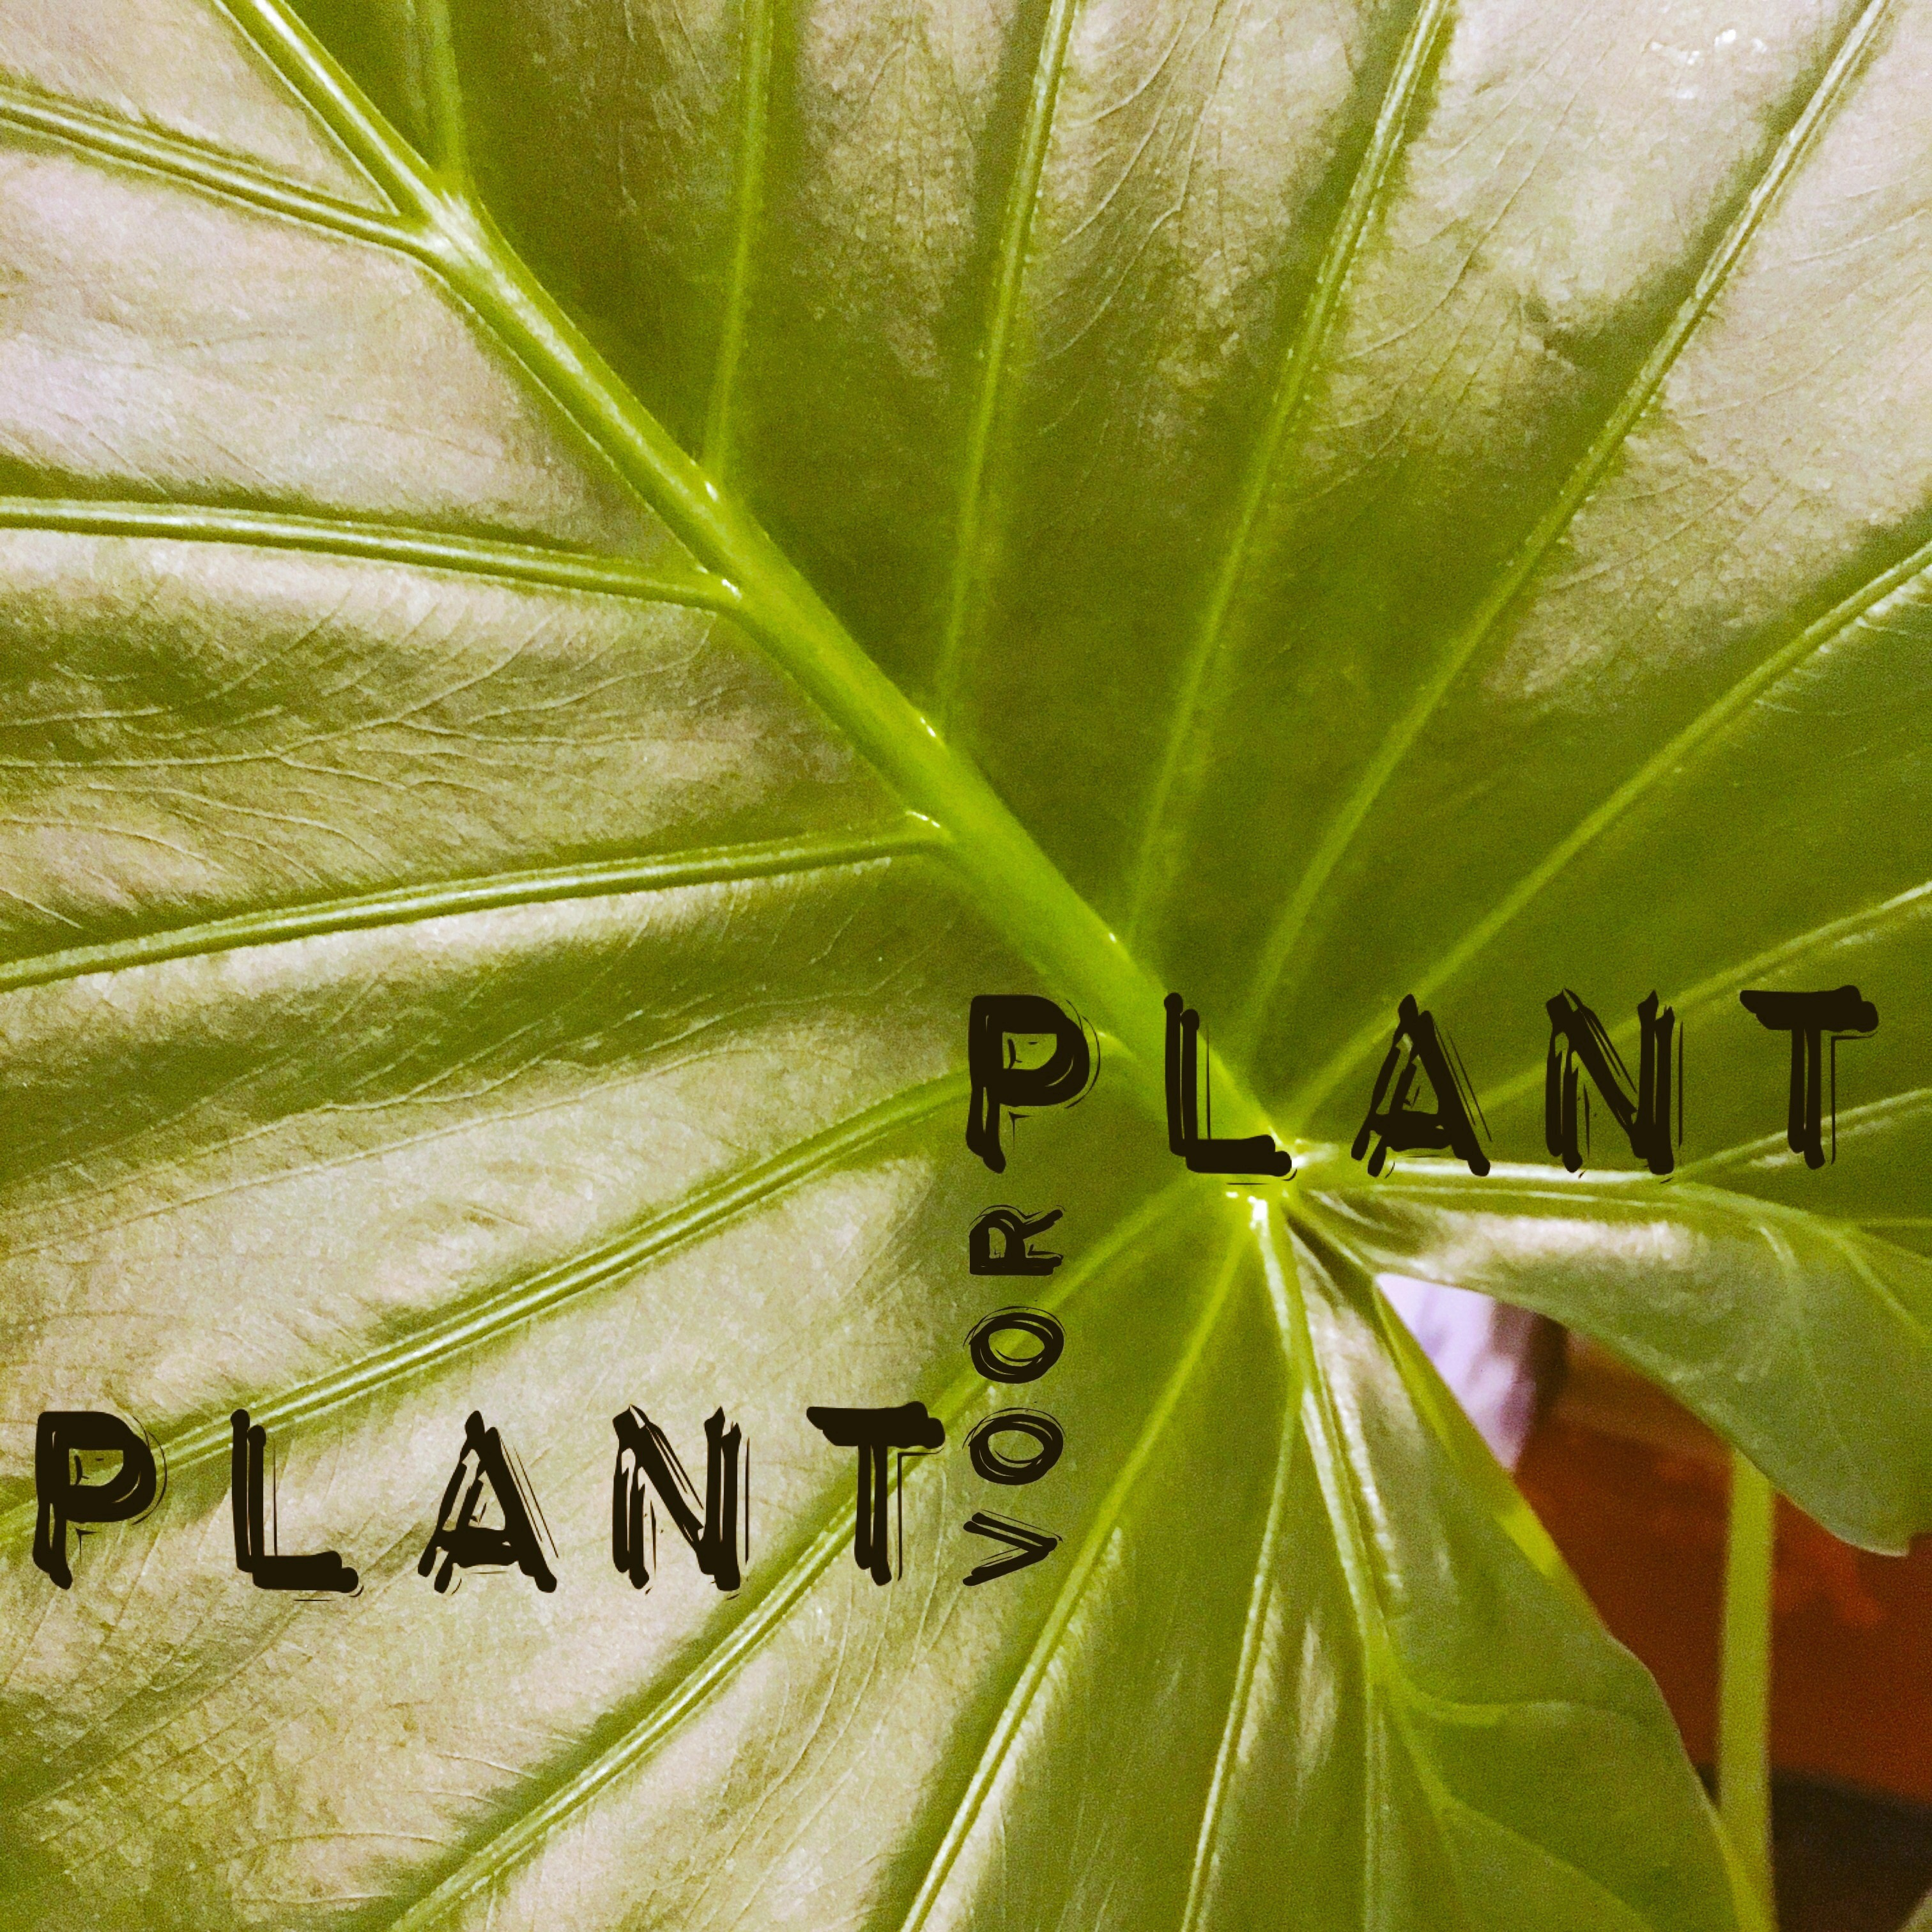 Plant voor Plant